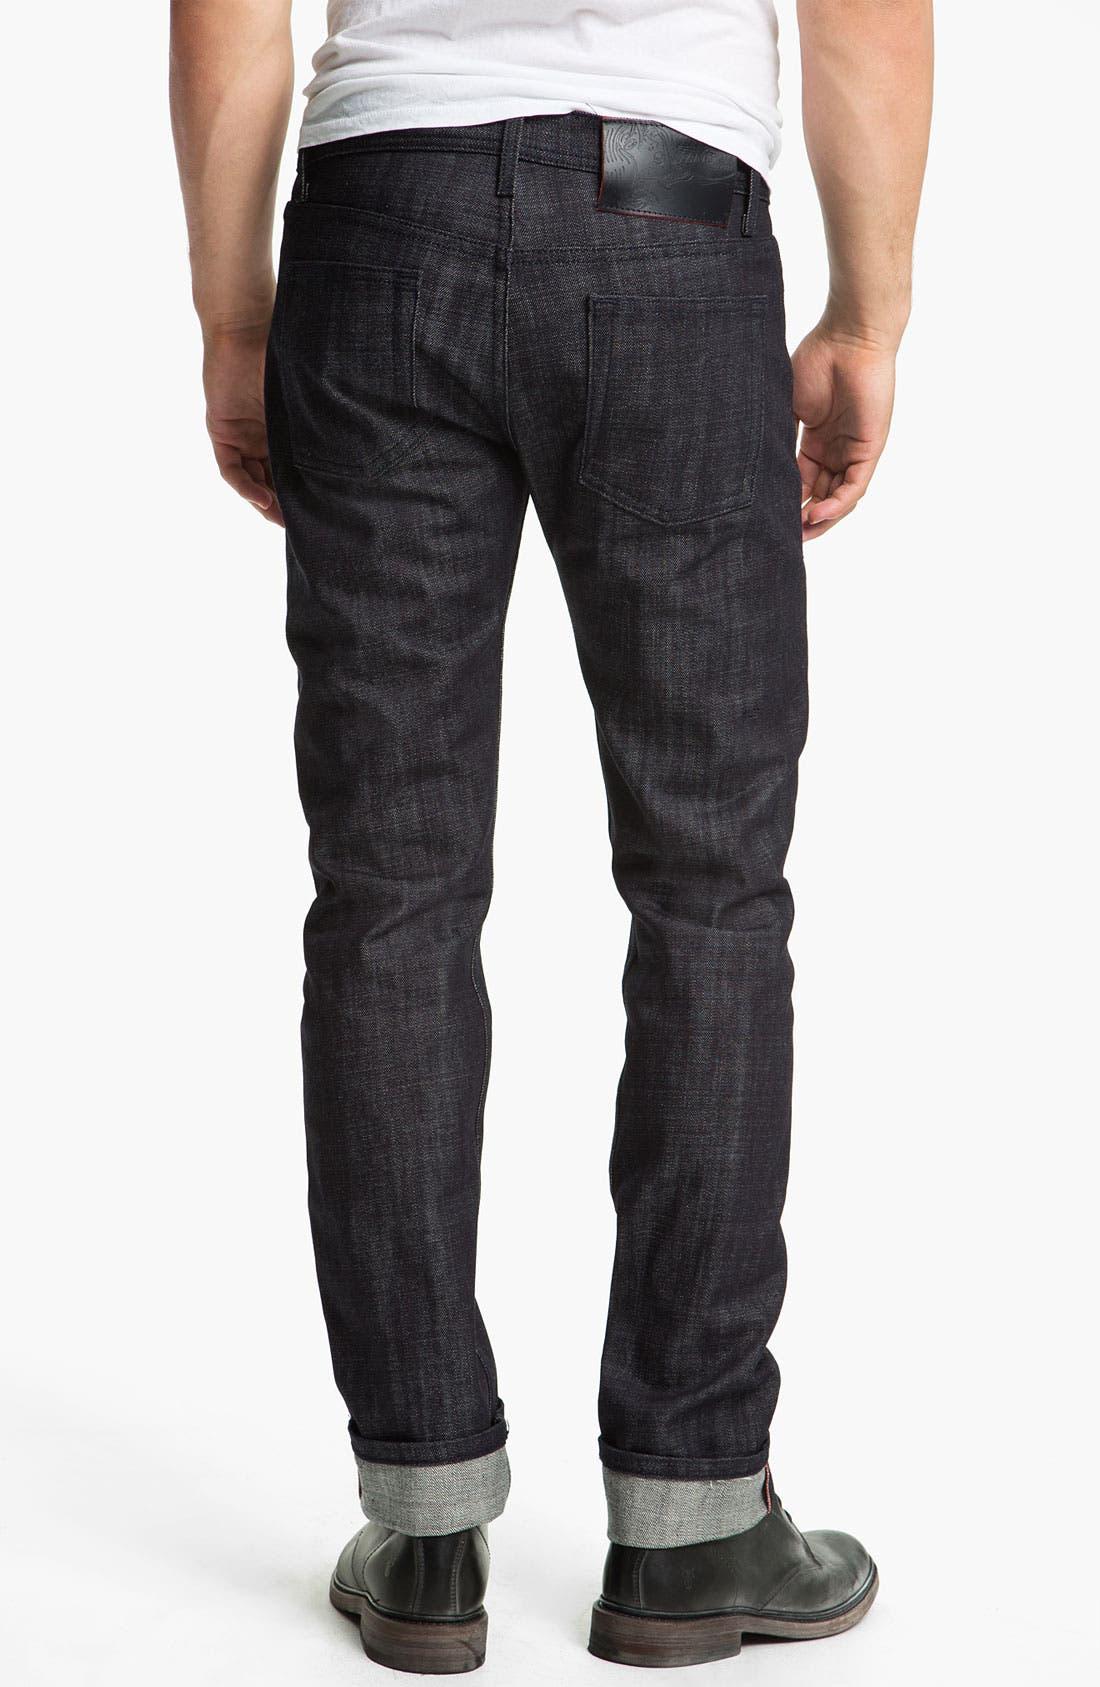 Alternate Image 1 Selected - Naked & Famous Denim 'Weird Guy' Slim Tapered Leg Red Core Selvedge Jeans (Indigo)